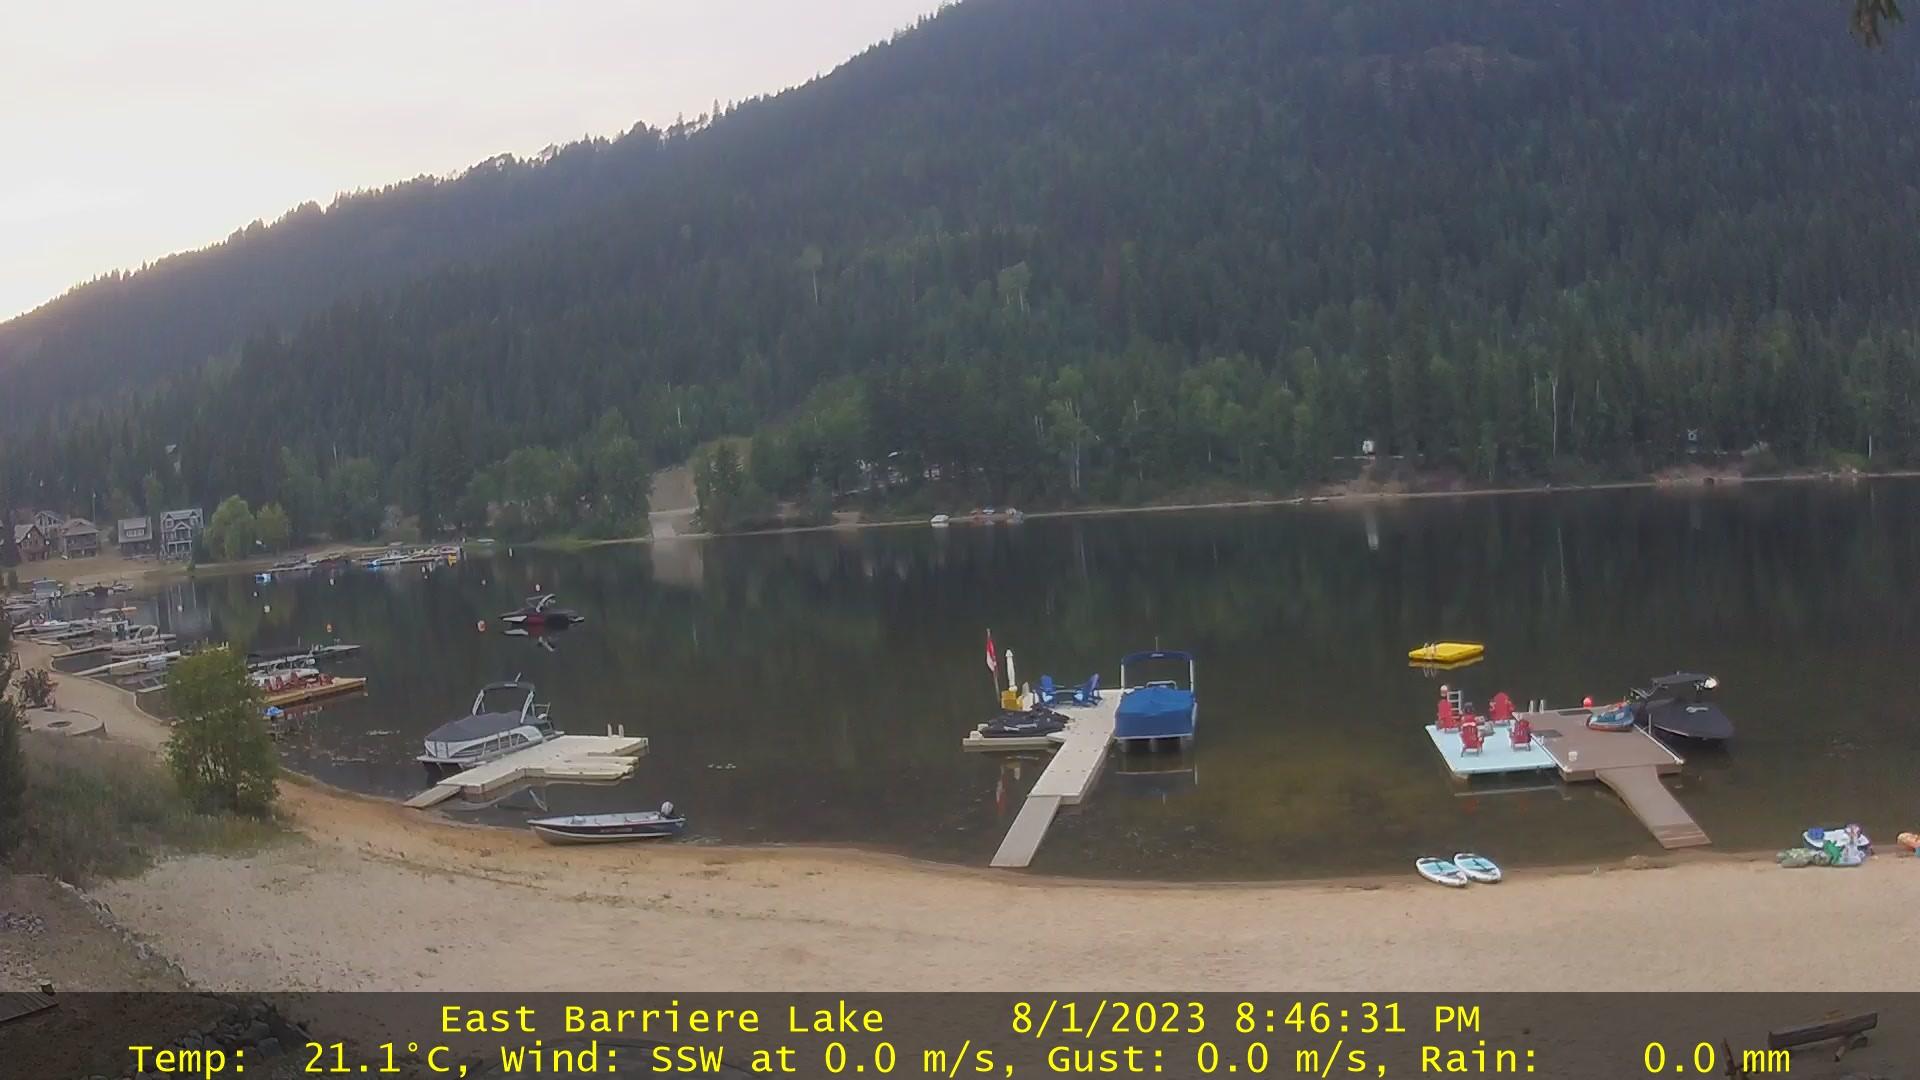 East Barriere Lake